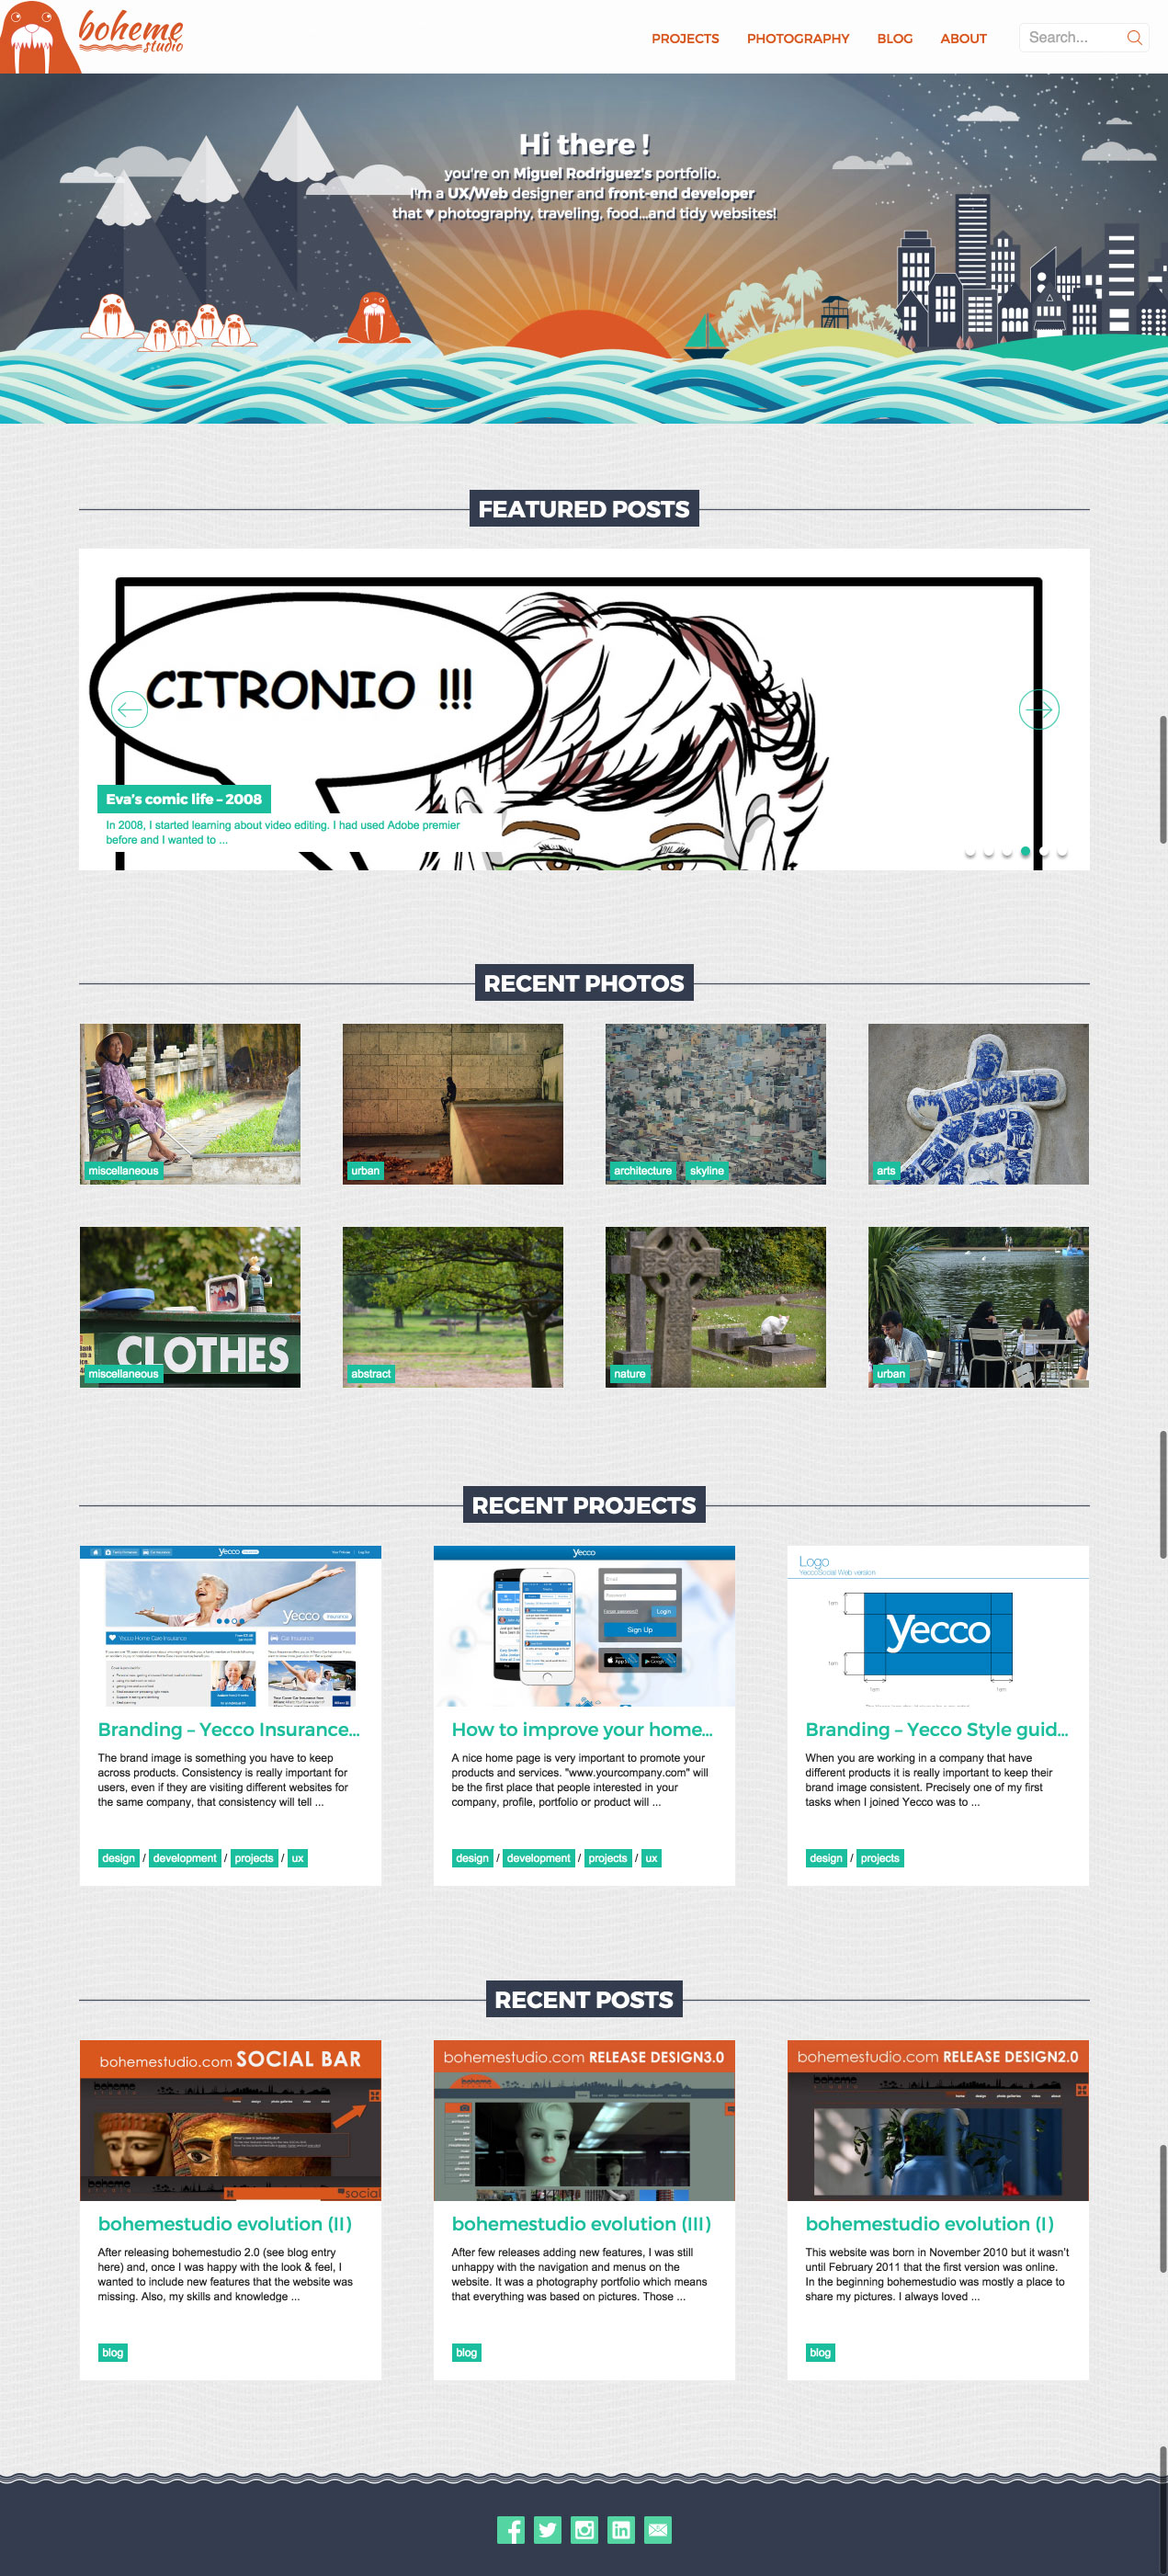 Bohemestudio 4.0 - Homepage